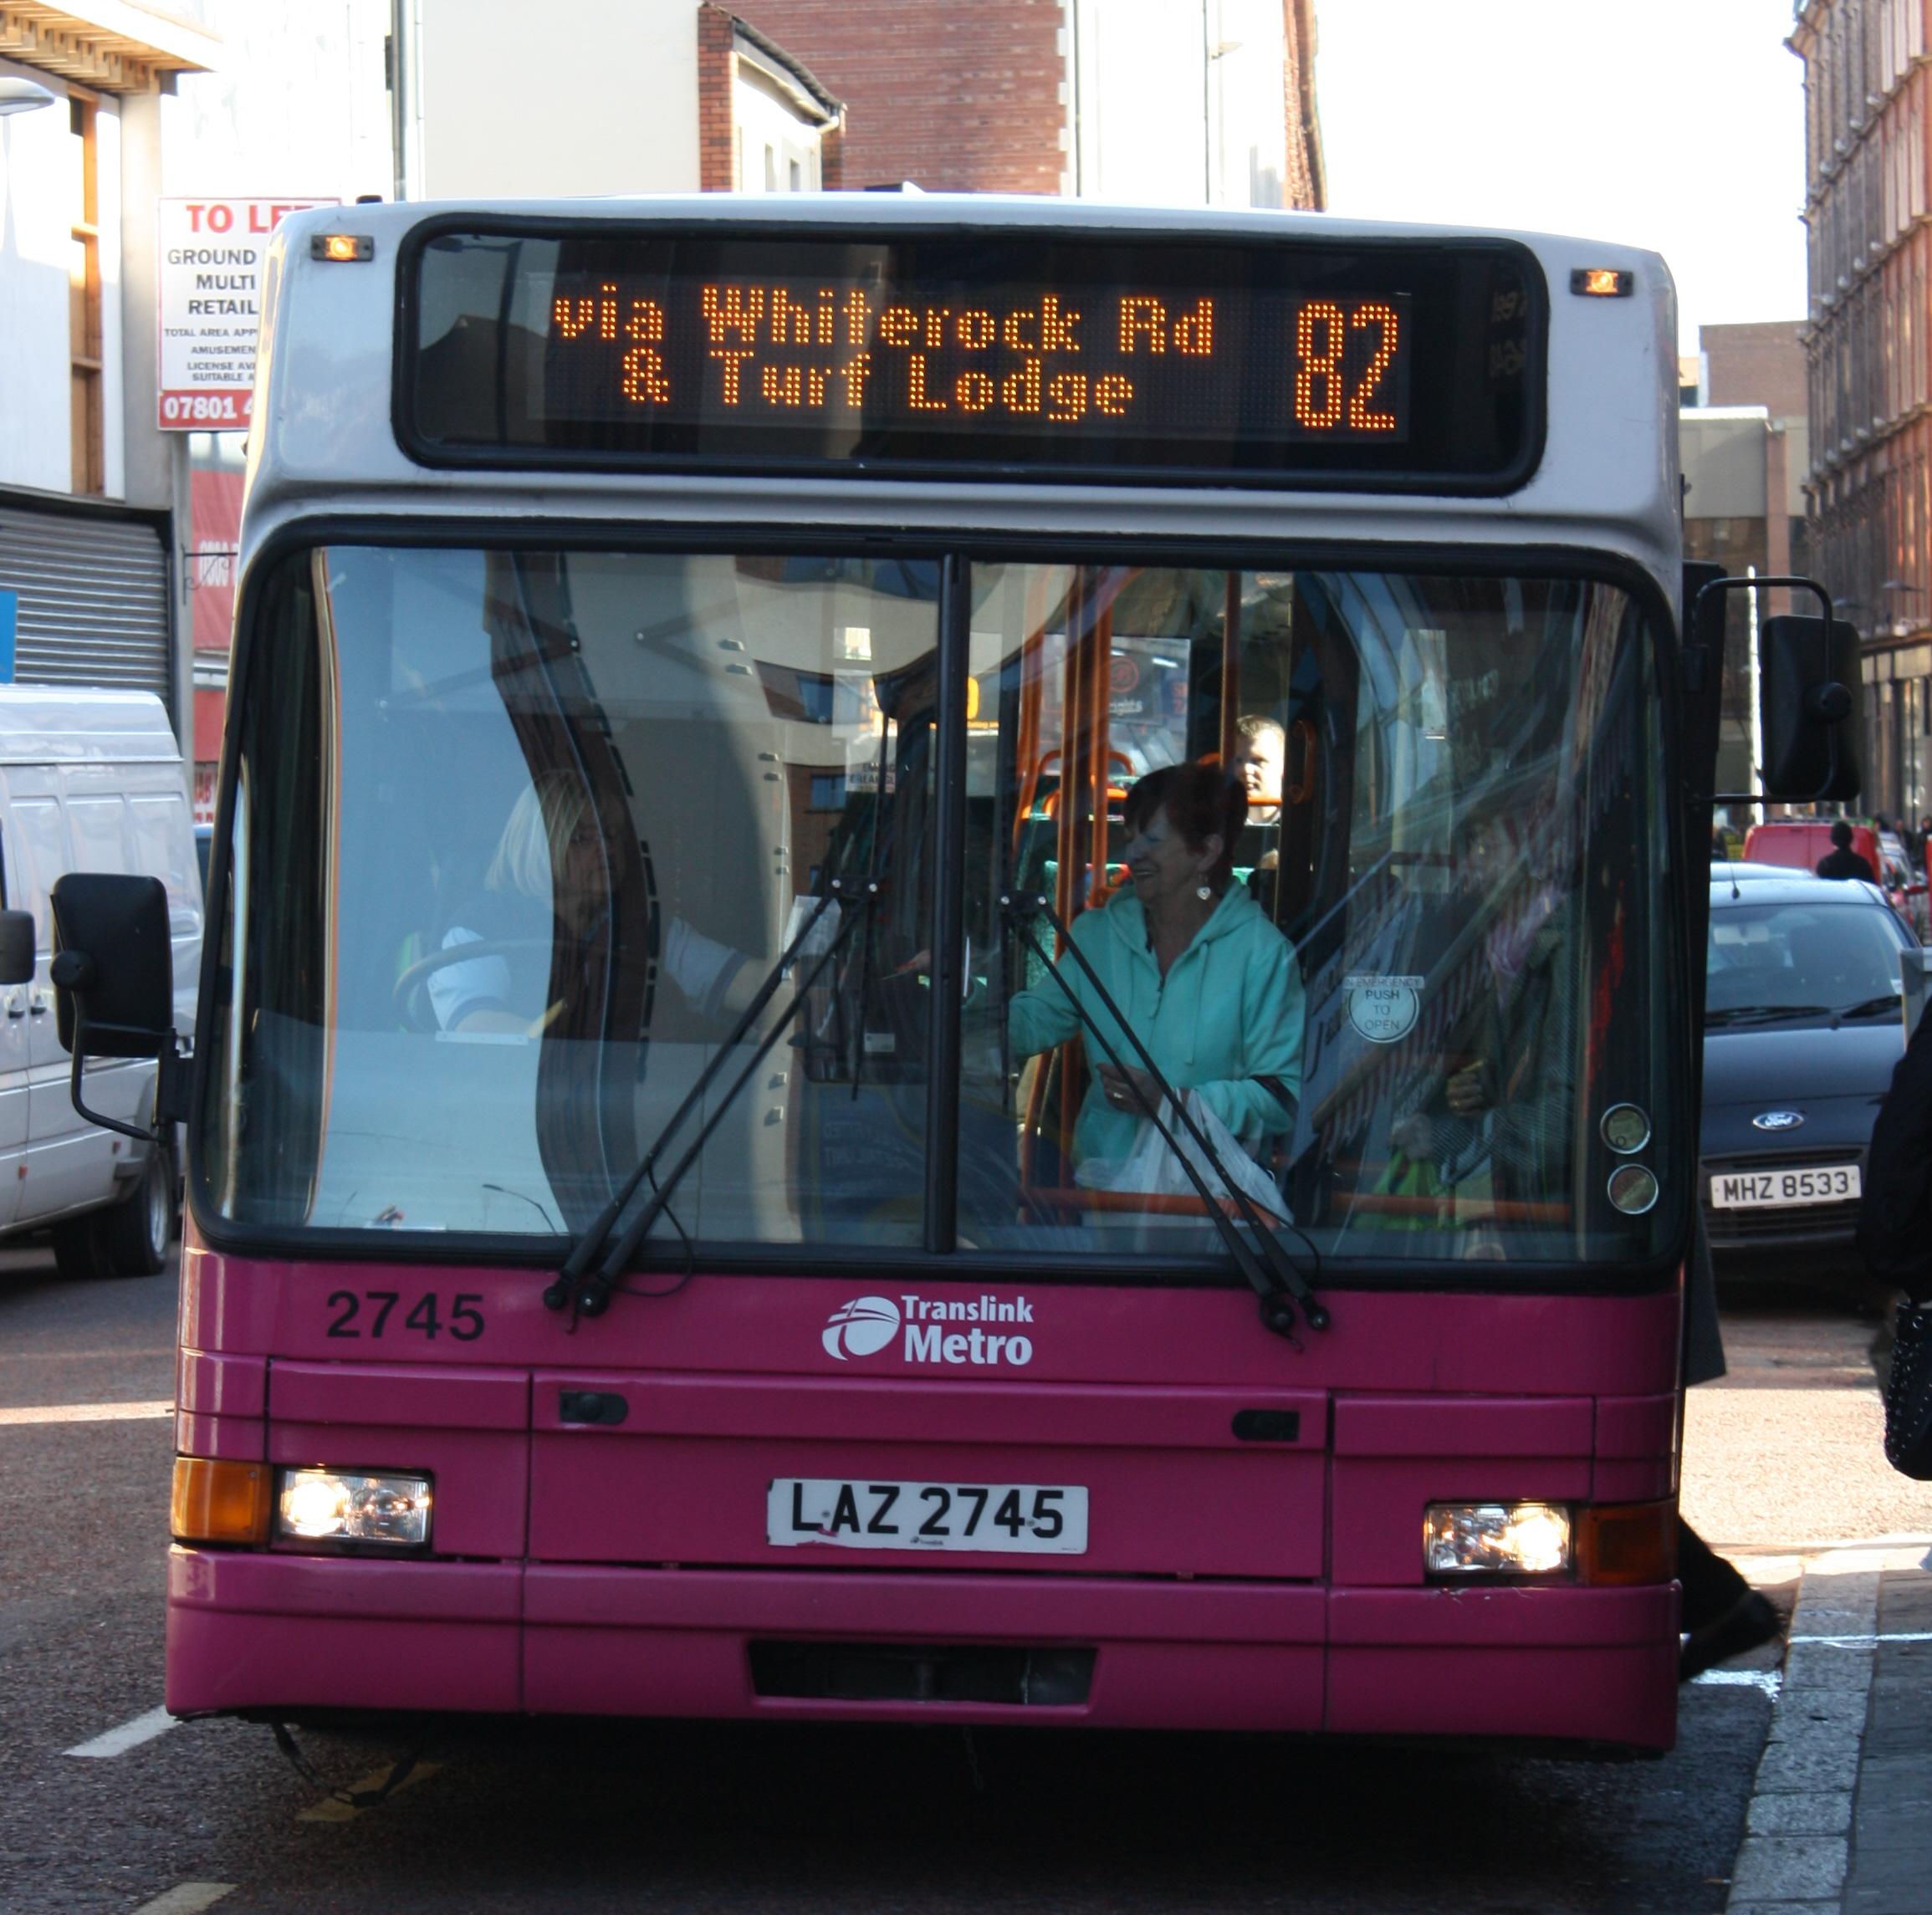 File:Metro (Belfast) bus 2745 (LAZ 2745) 1997 Volvo B10L Alexander